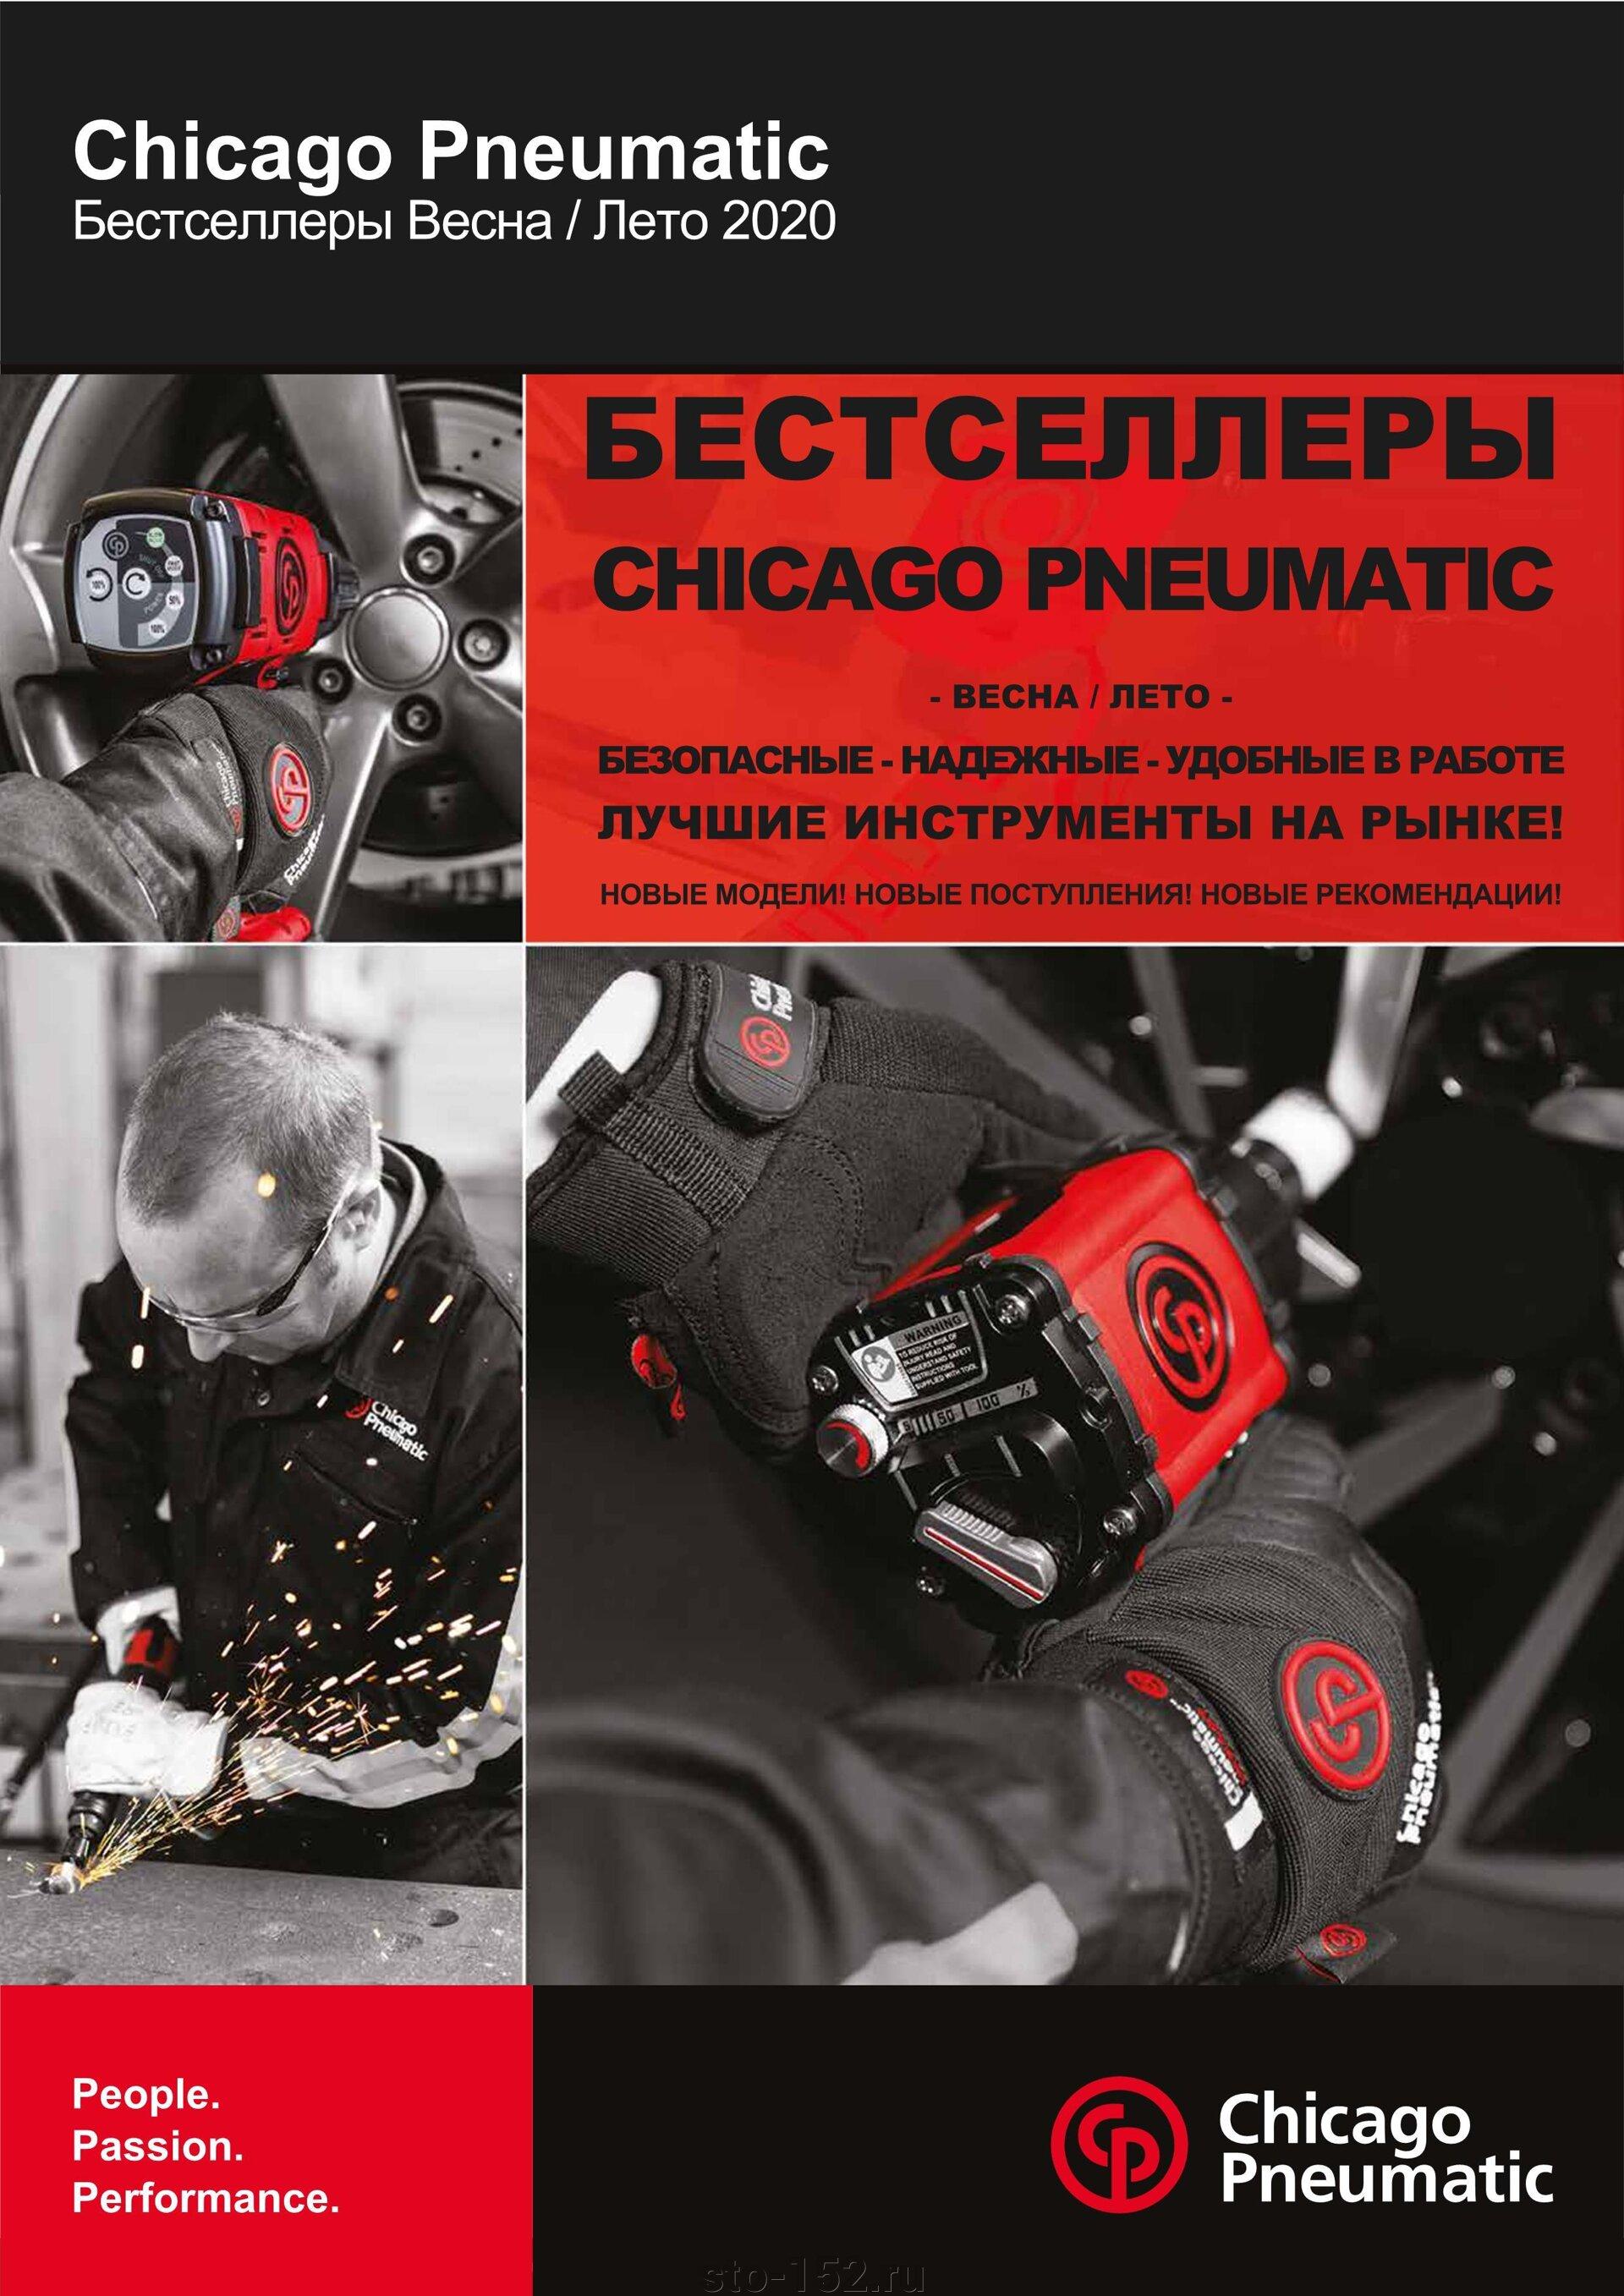 БЕСТСЕЛЛЕРЫ Chicago Pneumatic Весна/Лето 2020 - лучший инструмент на рынке! - фото pic_a2ece989e030522d1662a461e0465f83_1920x9000_1.jpg